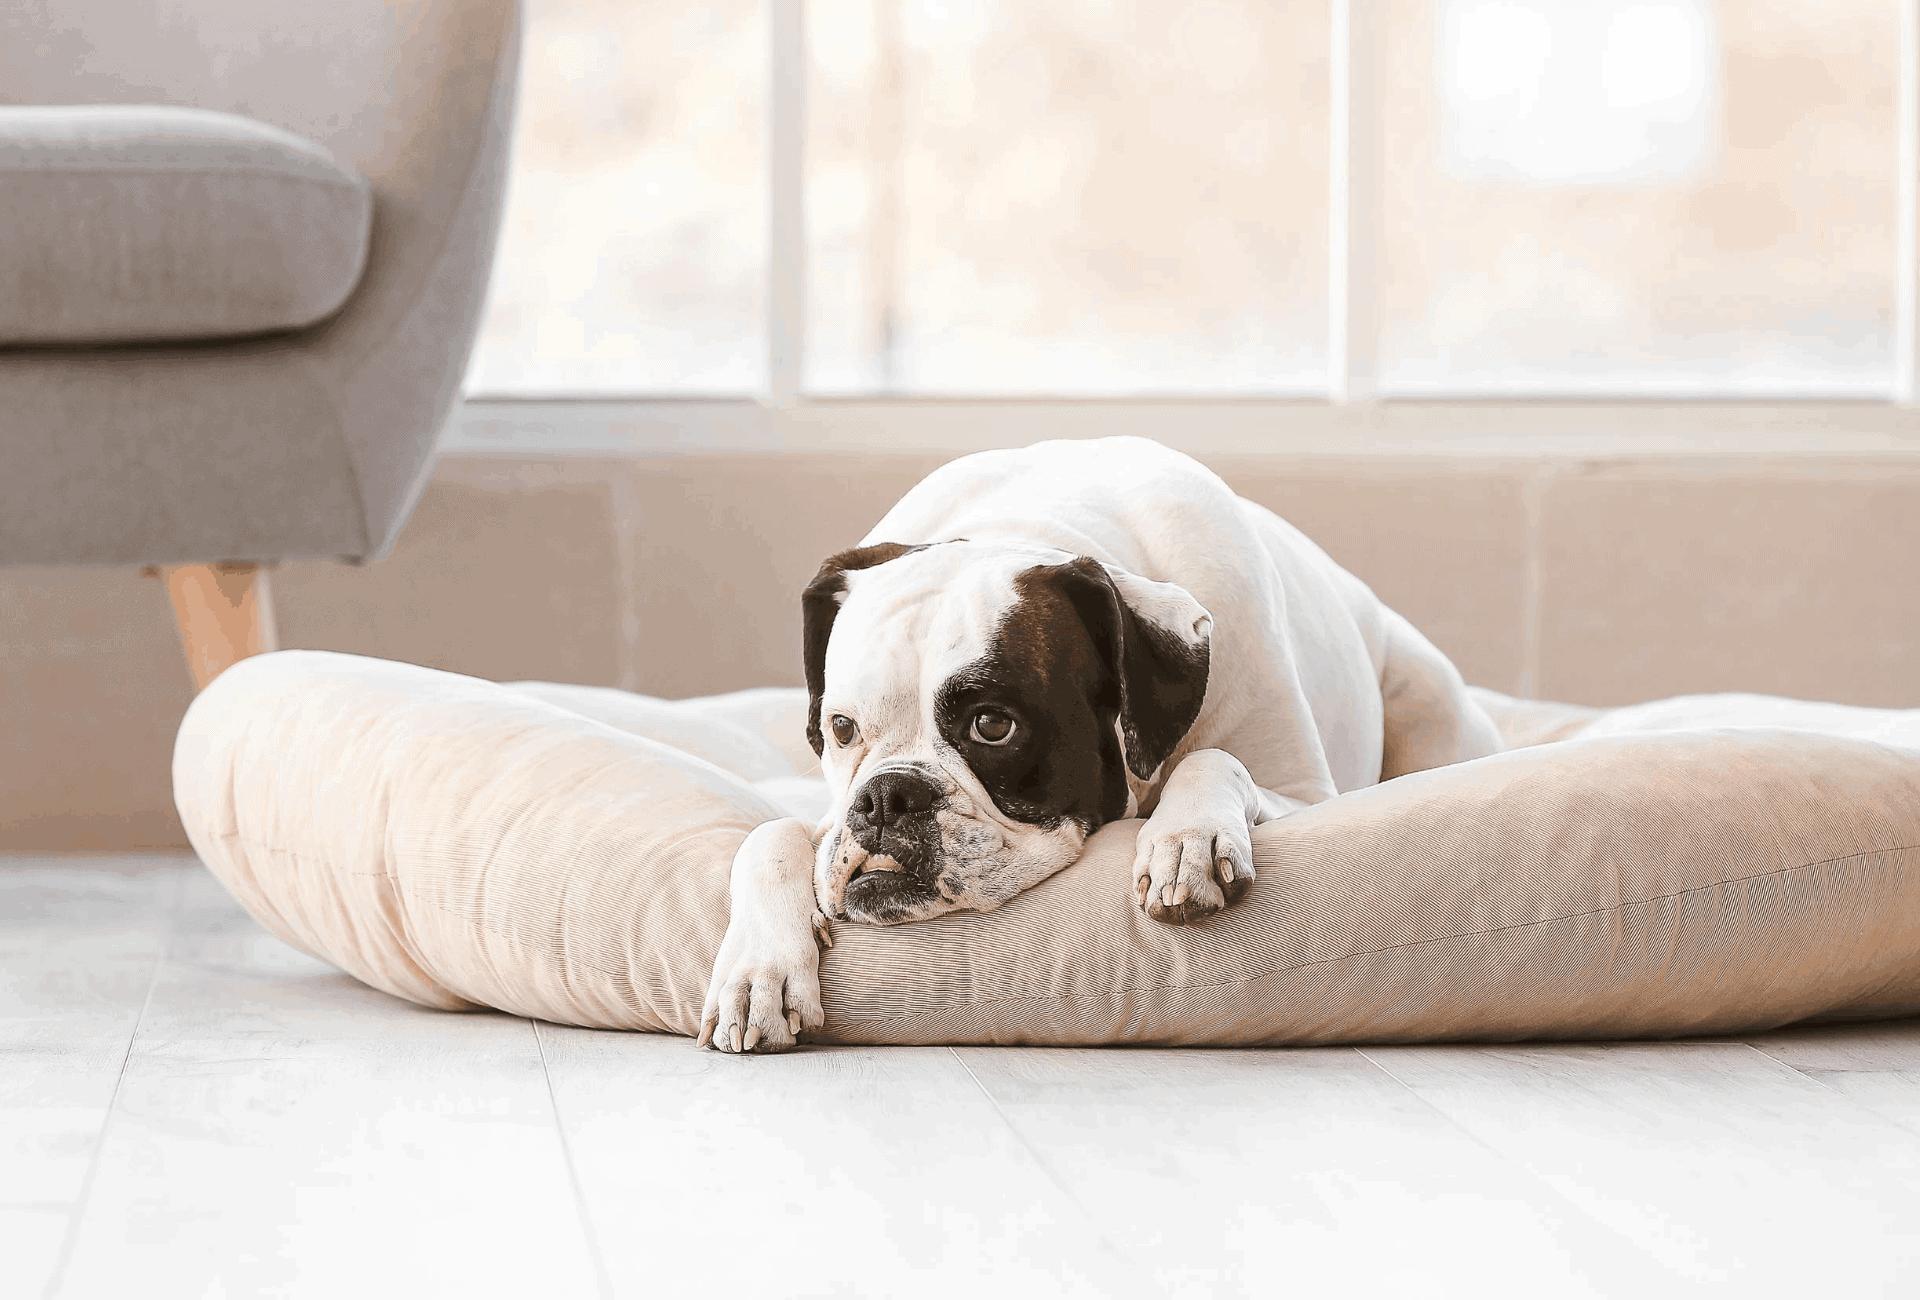 Bulldog laying in his bed at home